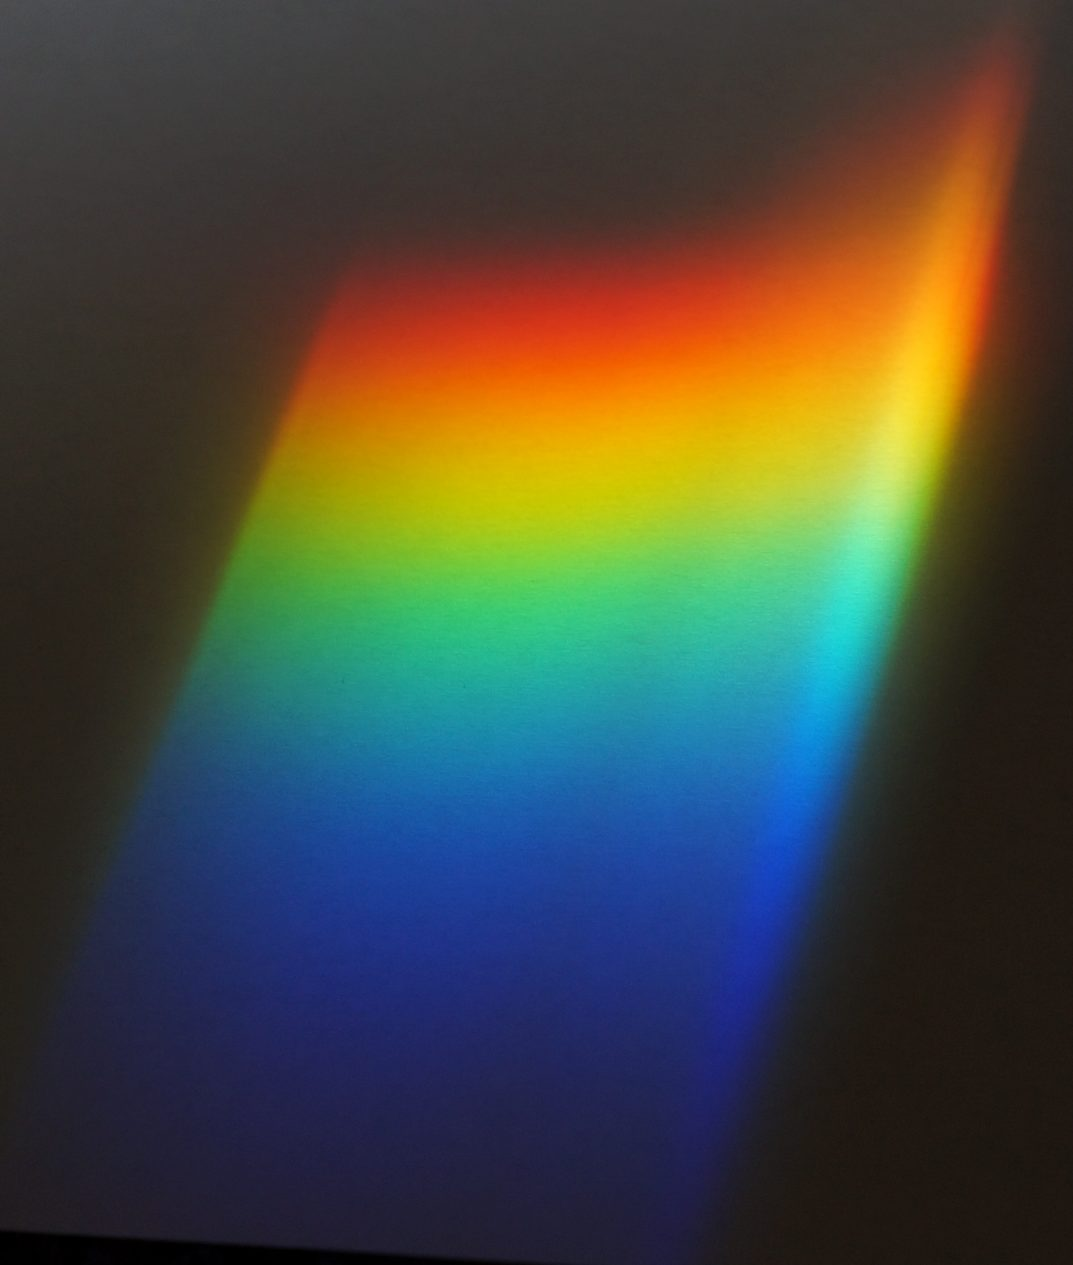 Lightstrike Prism Spectrum